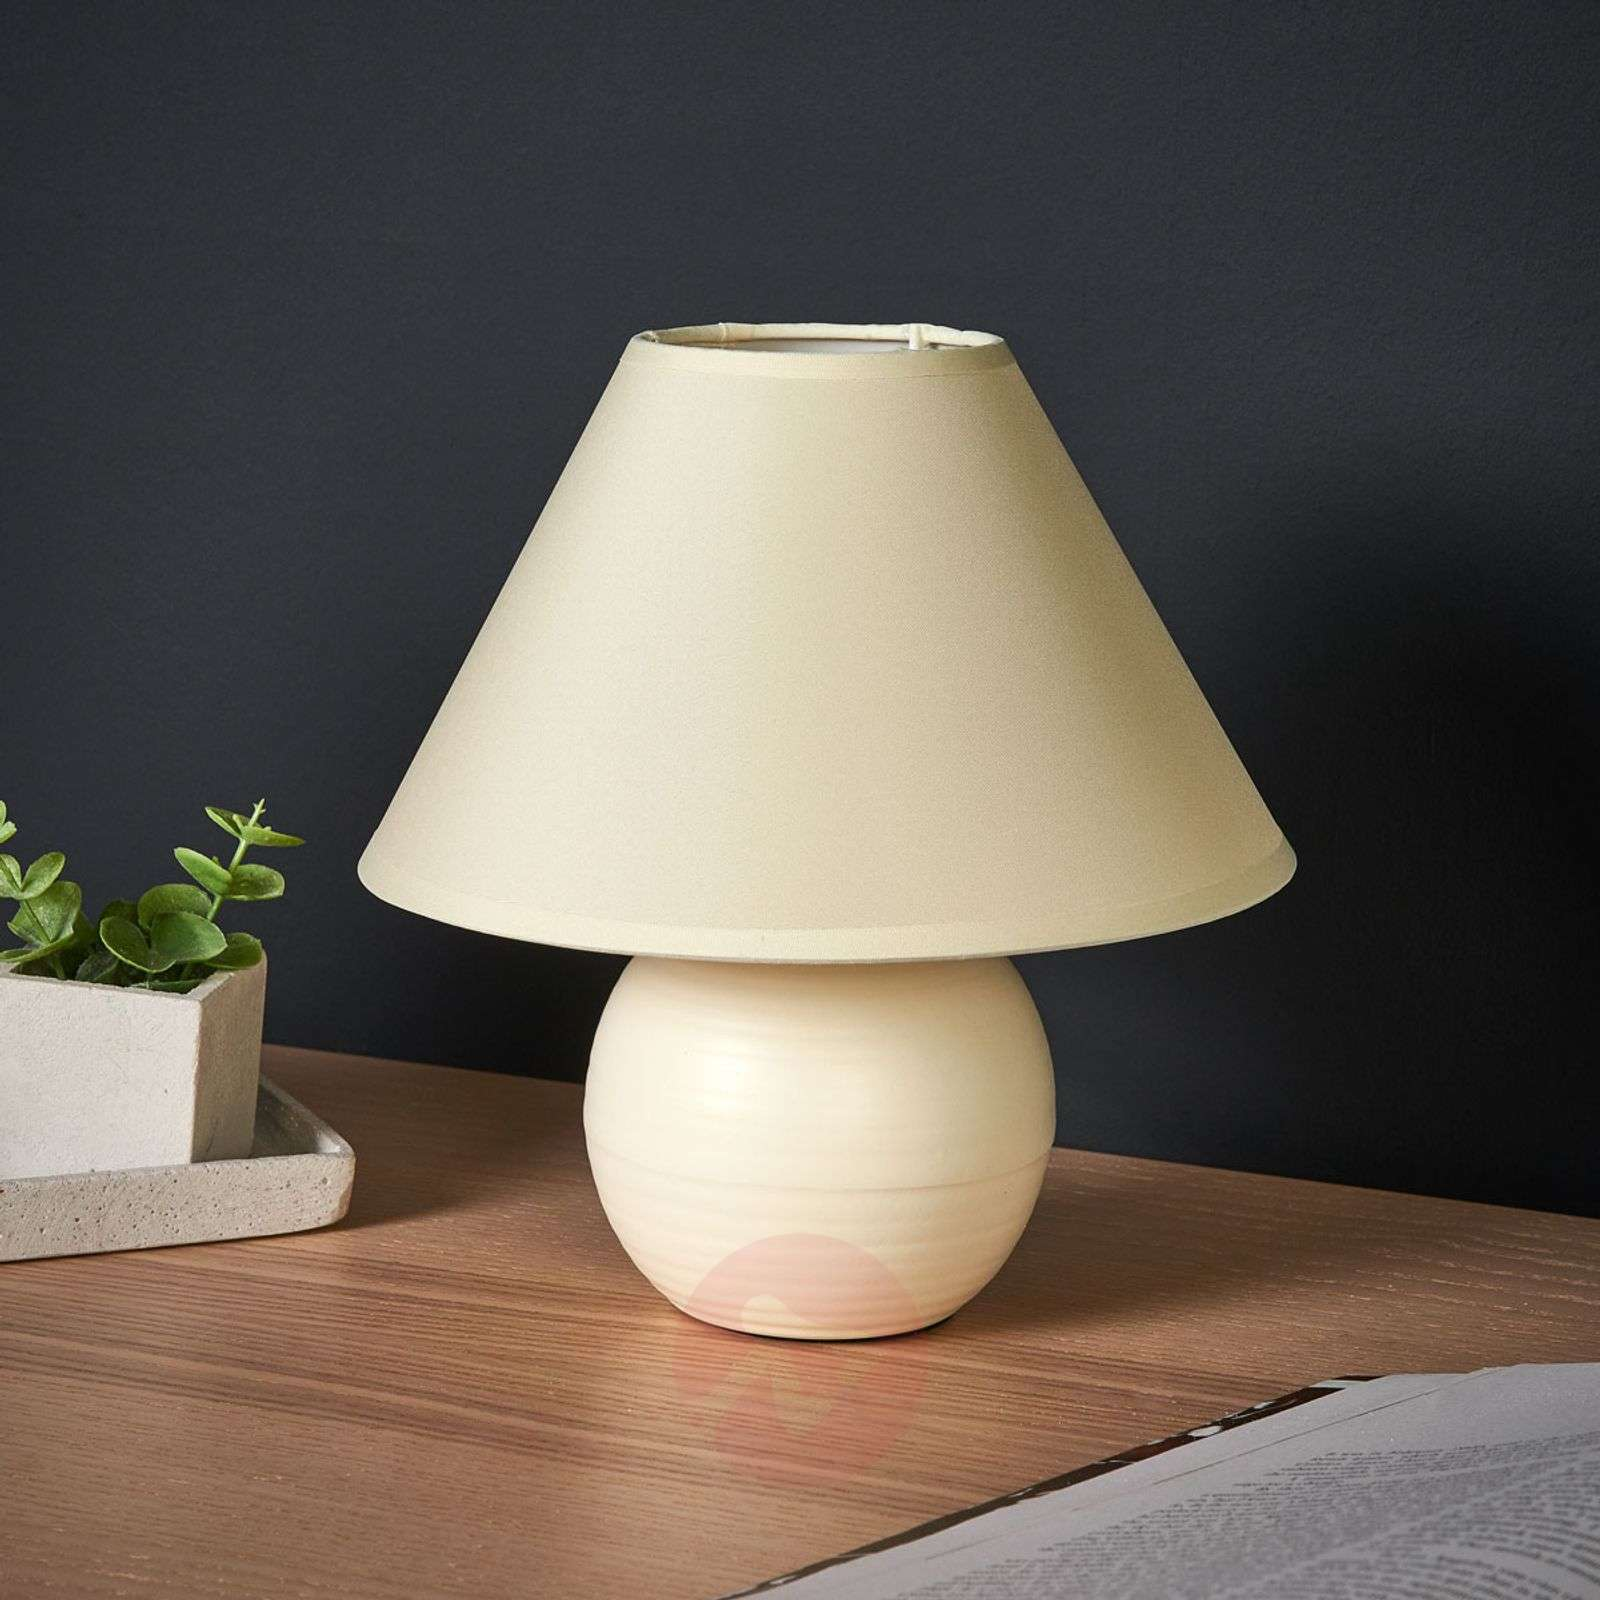 Cream-coloured Kaddy table lamp with ceramic base-6054940-01